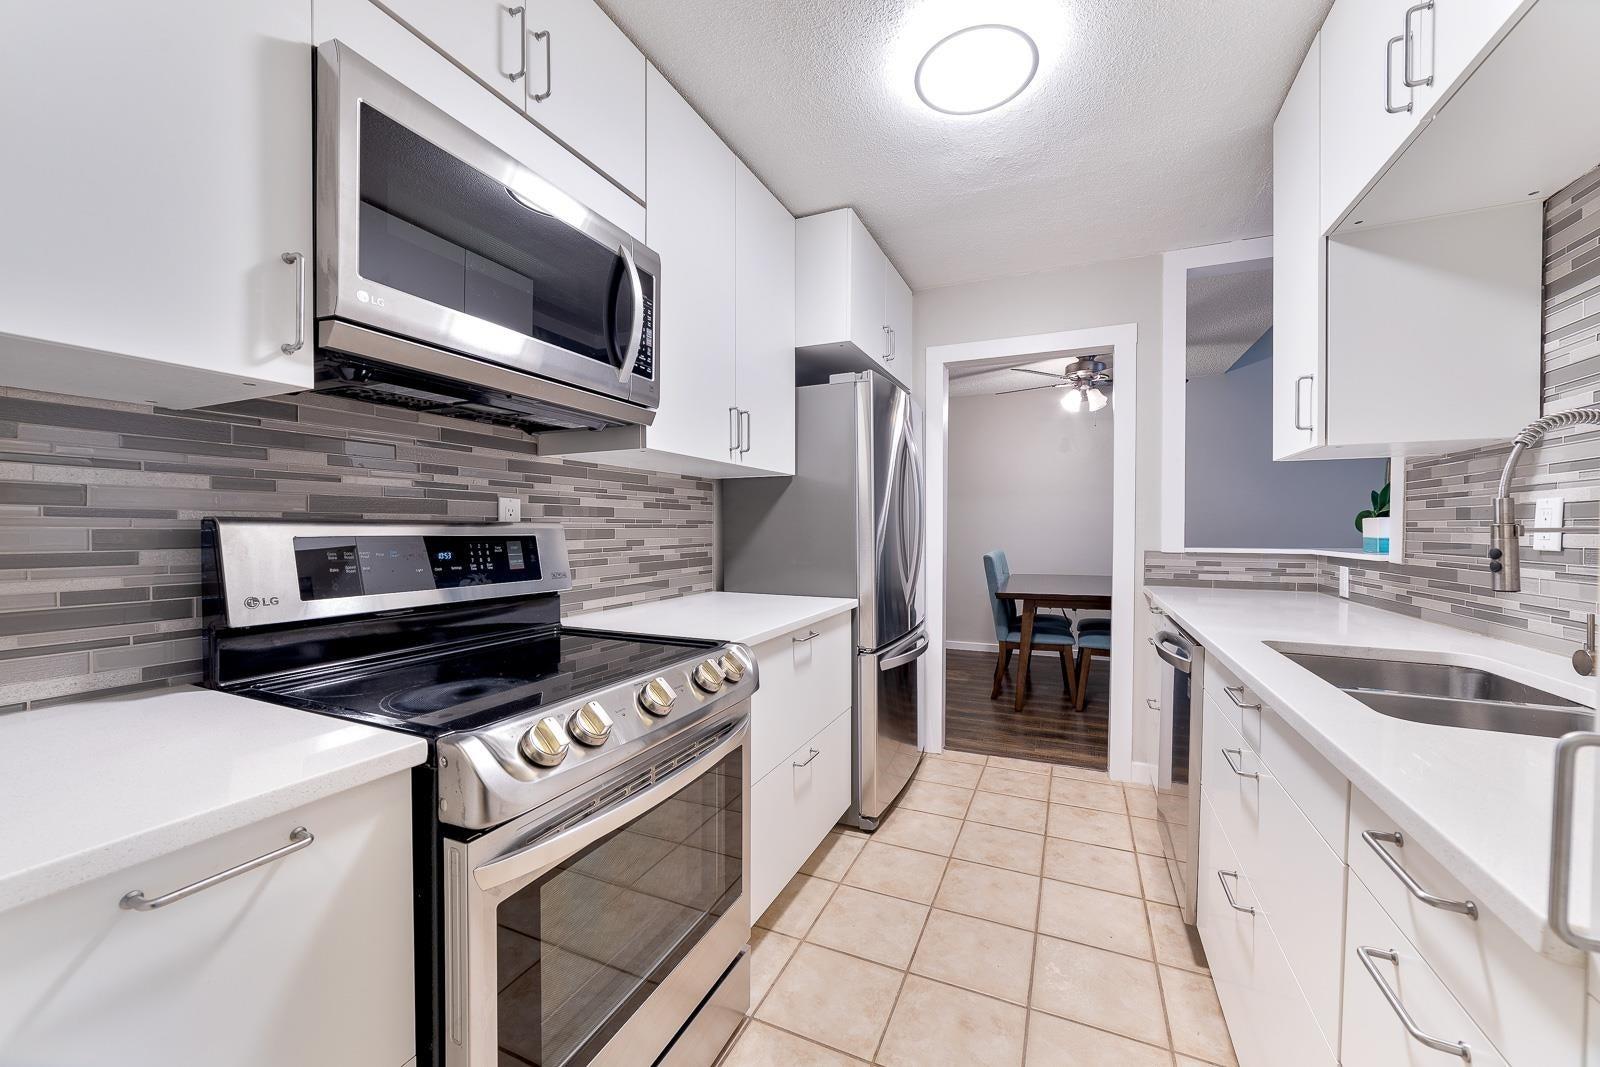 329 3411 SPRINGFIELD DRIVE - Steveston North Apartment/Condo for sale, 3 Bedrooms (R2626135)